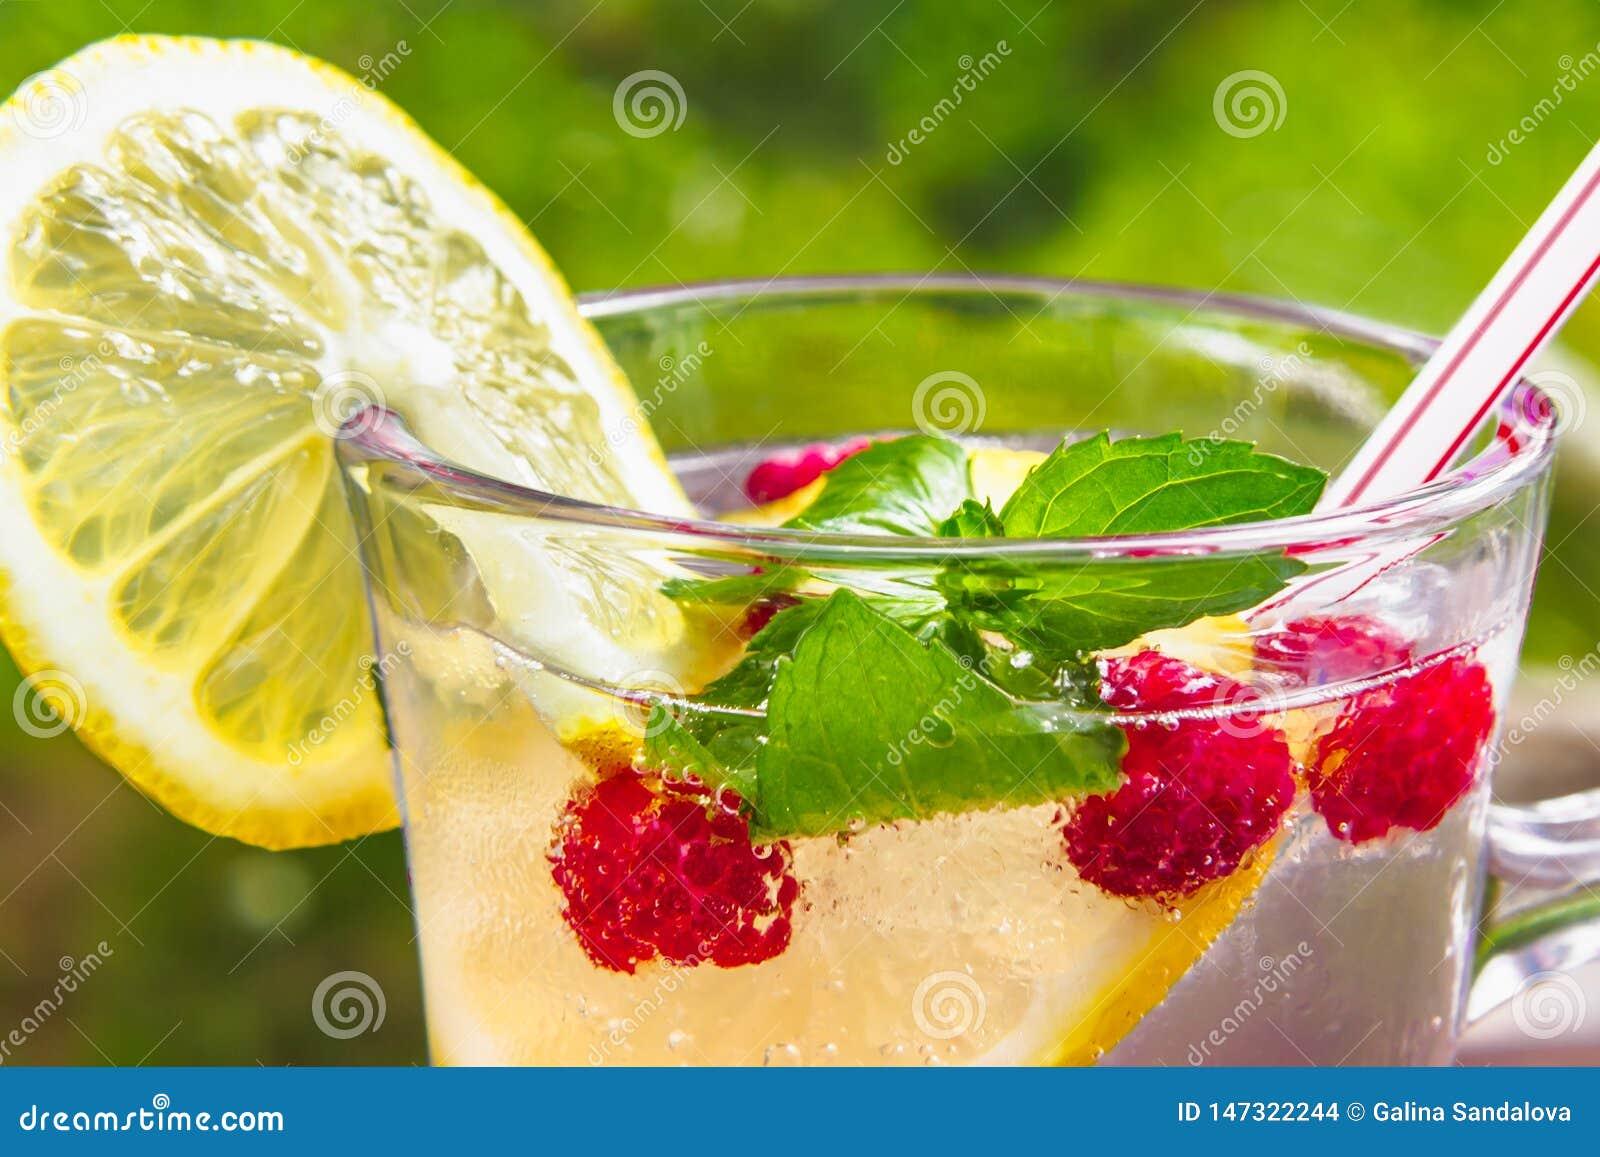 Verfrissende de zomercocktail met citroen, frambozen en muntclose-up